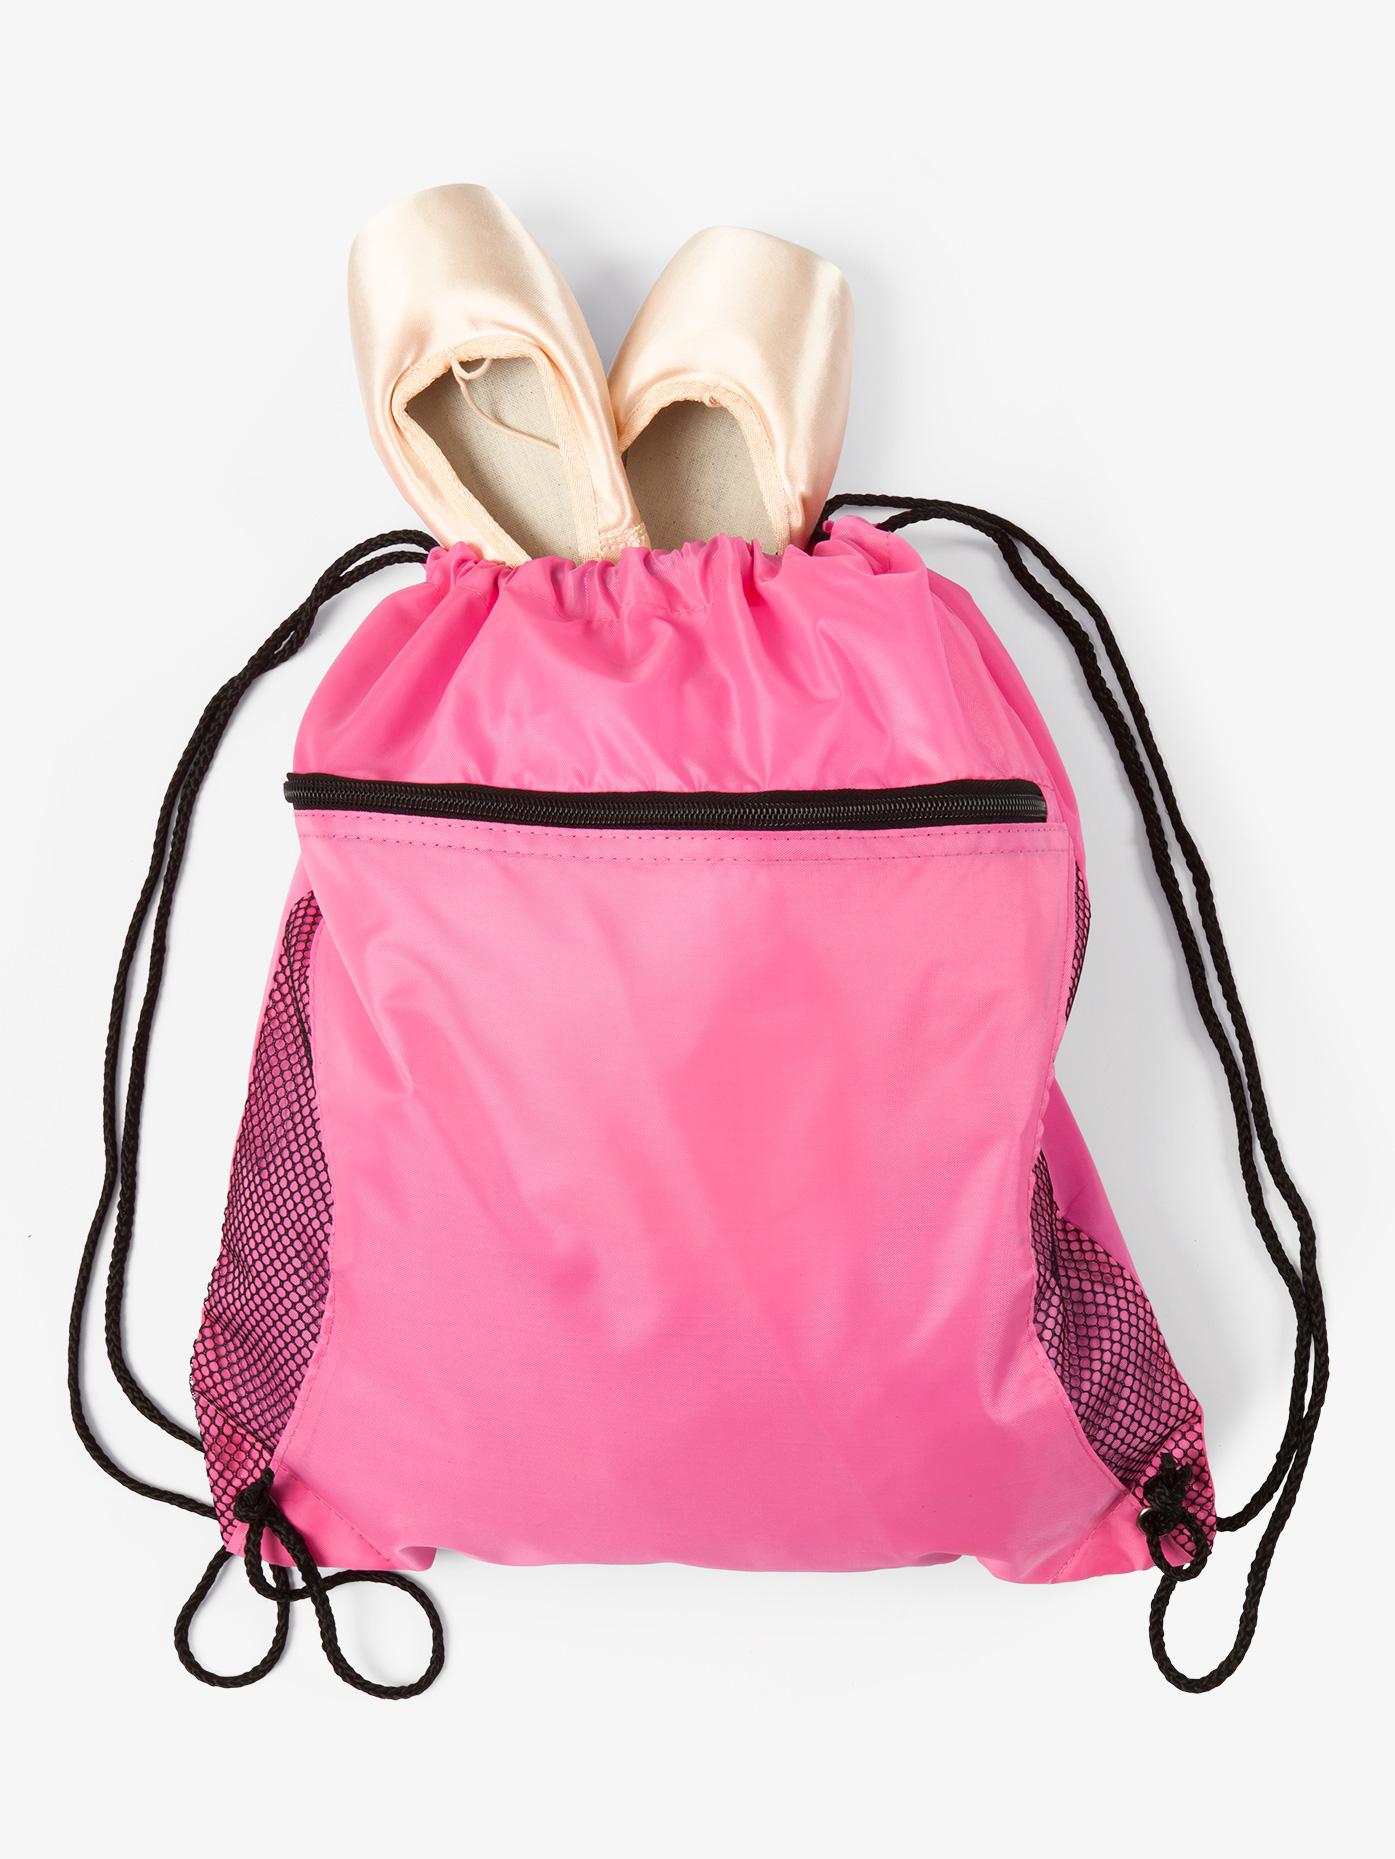 B-YOU Drawstring Dance Bag FP044